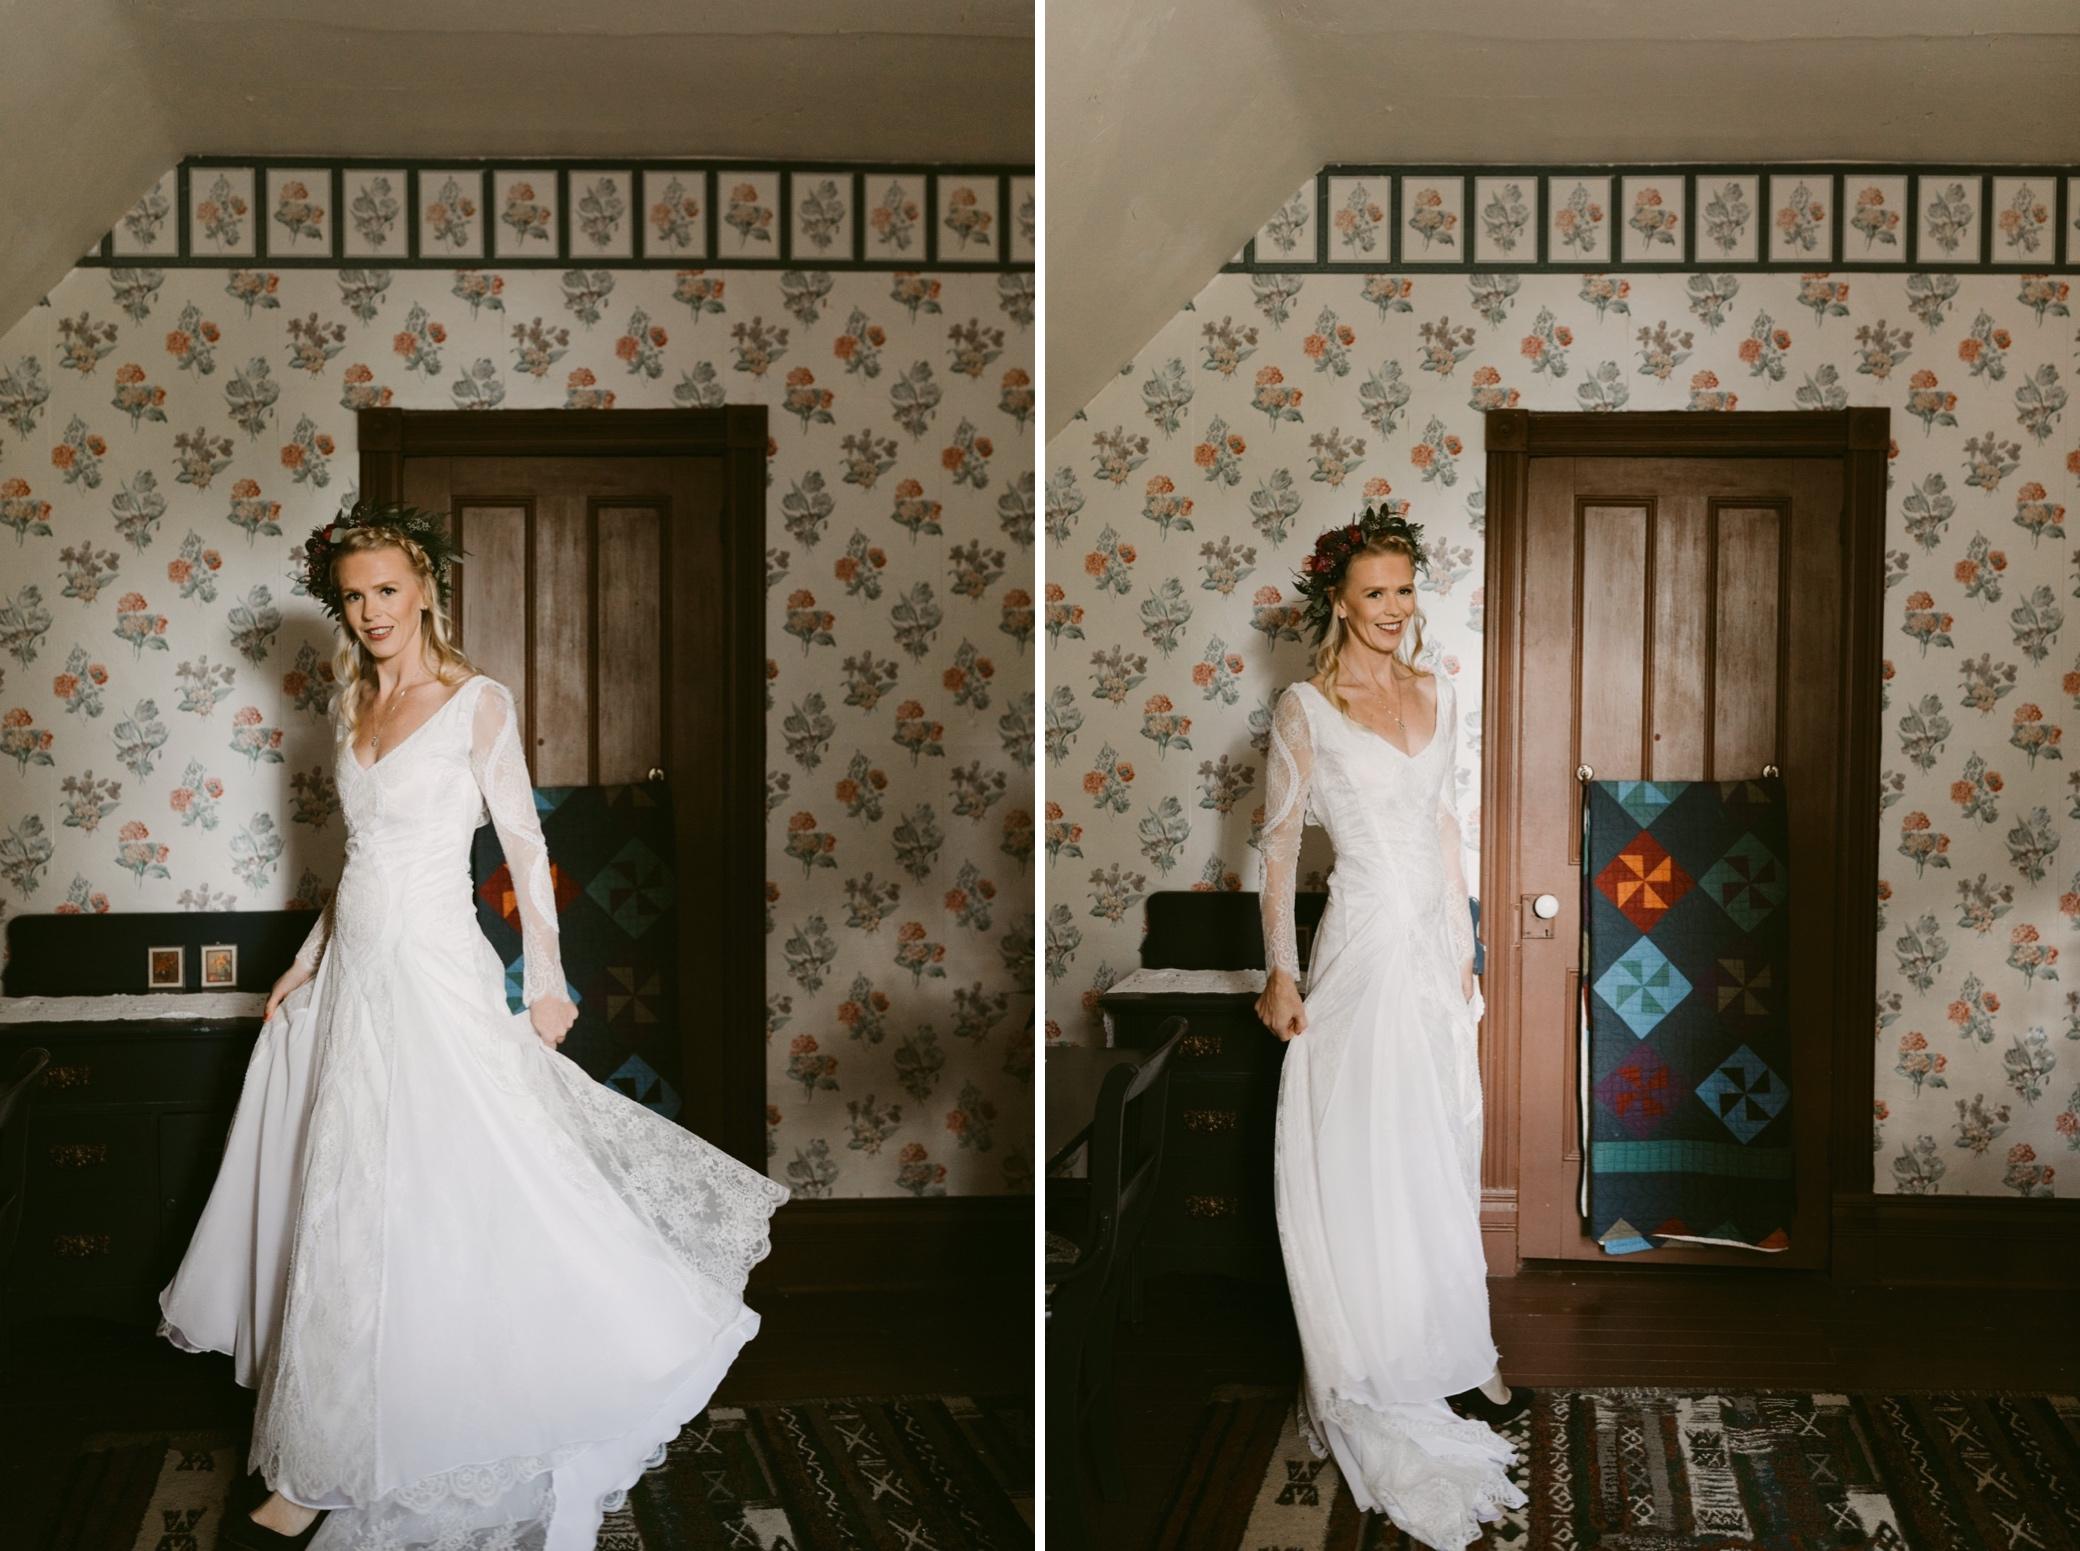 041_Huntsville Wedding  (147 of 689)_Huntsville Wedding  (144 of 689).jpg